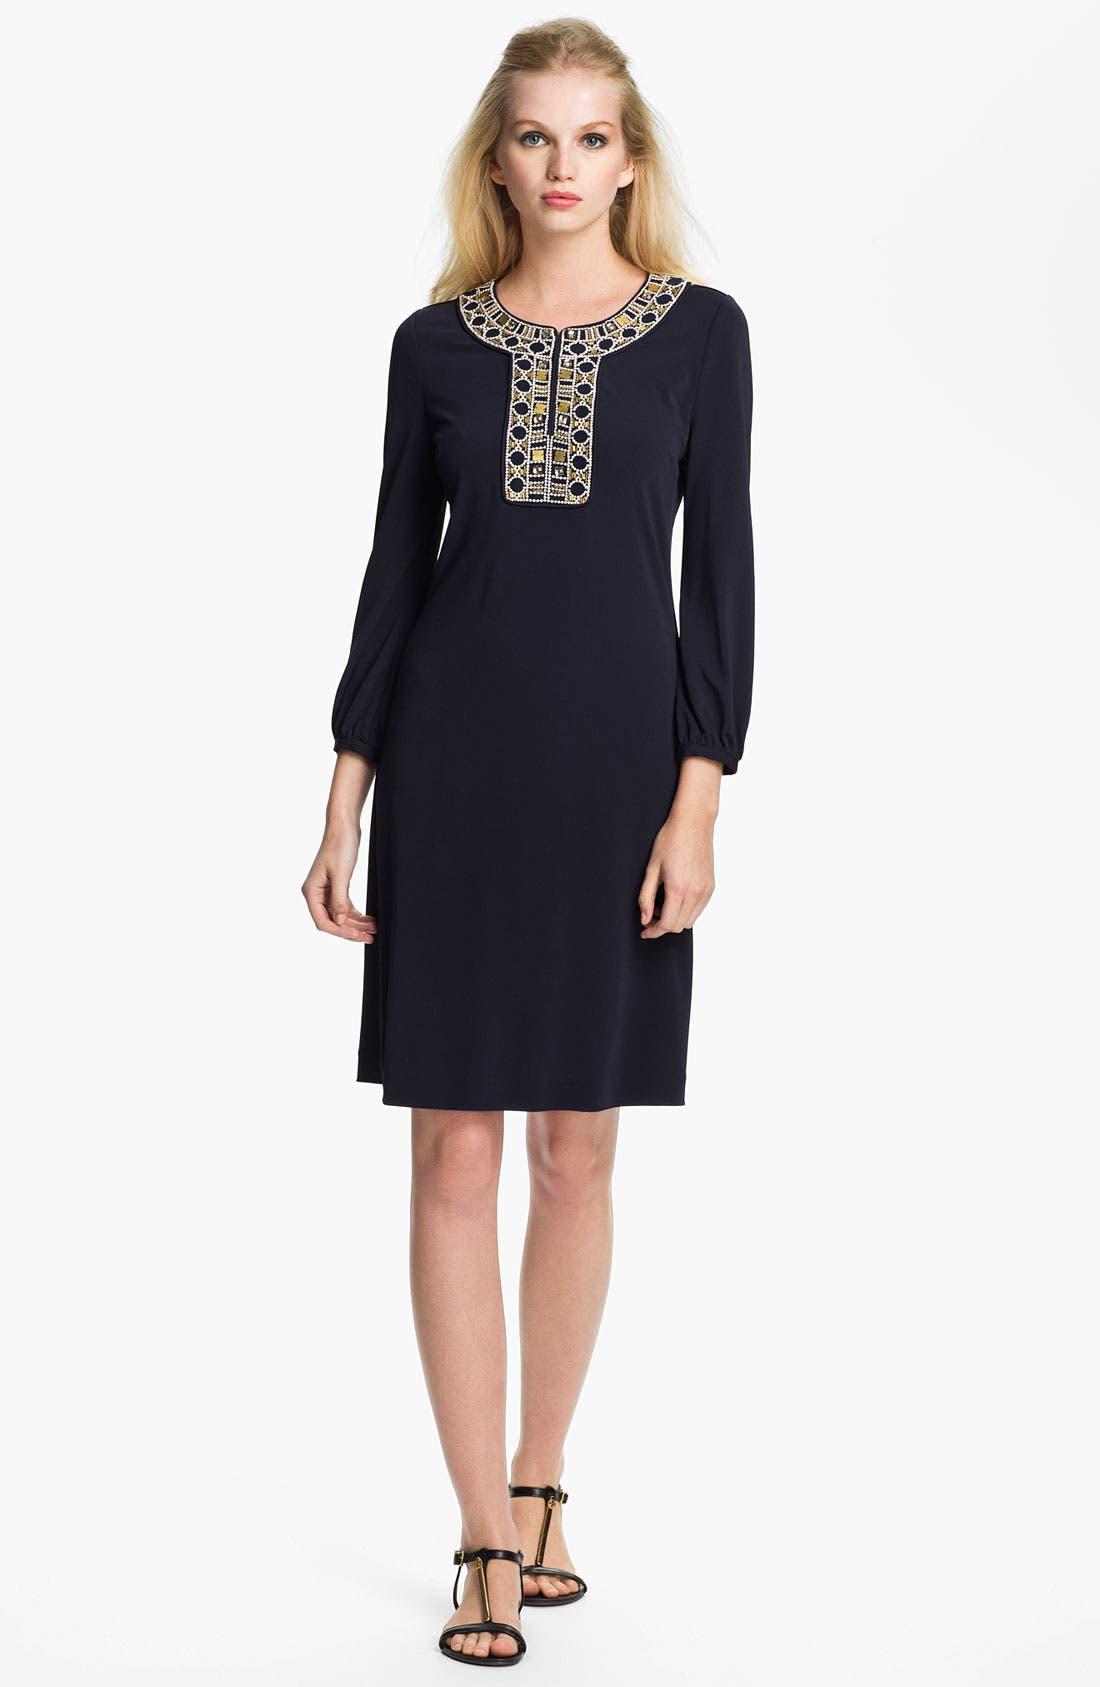 Main Image - Tory Burch 'Carissa' Embellished Sheath Dress